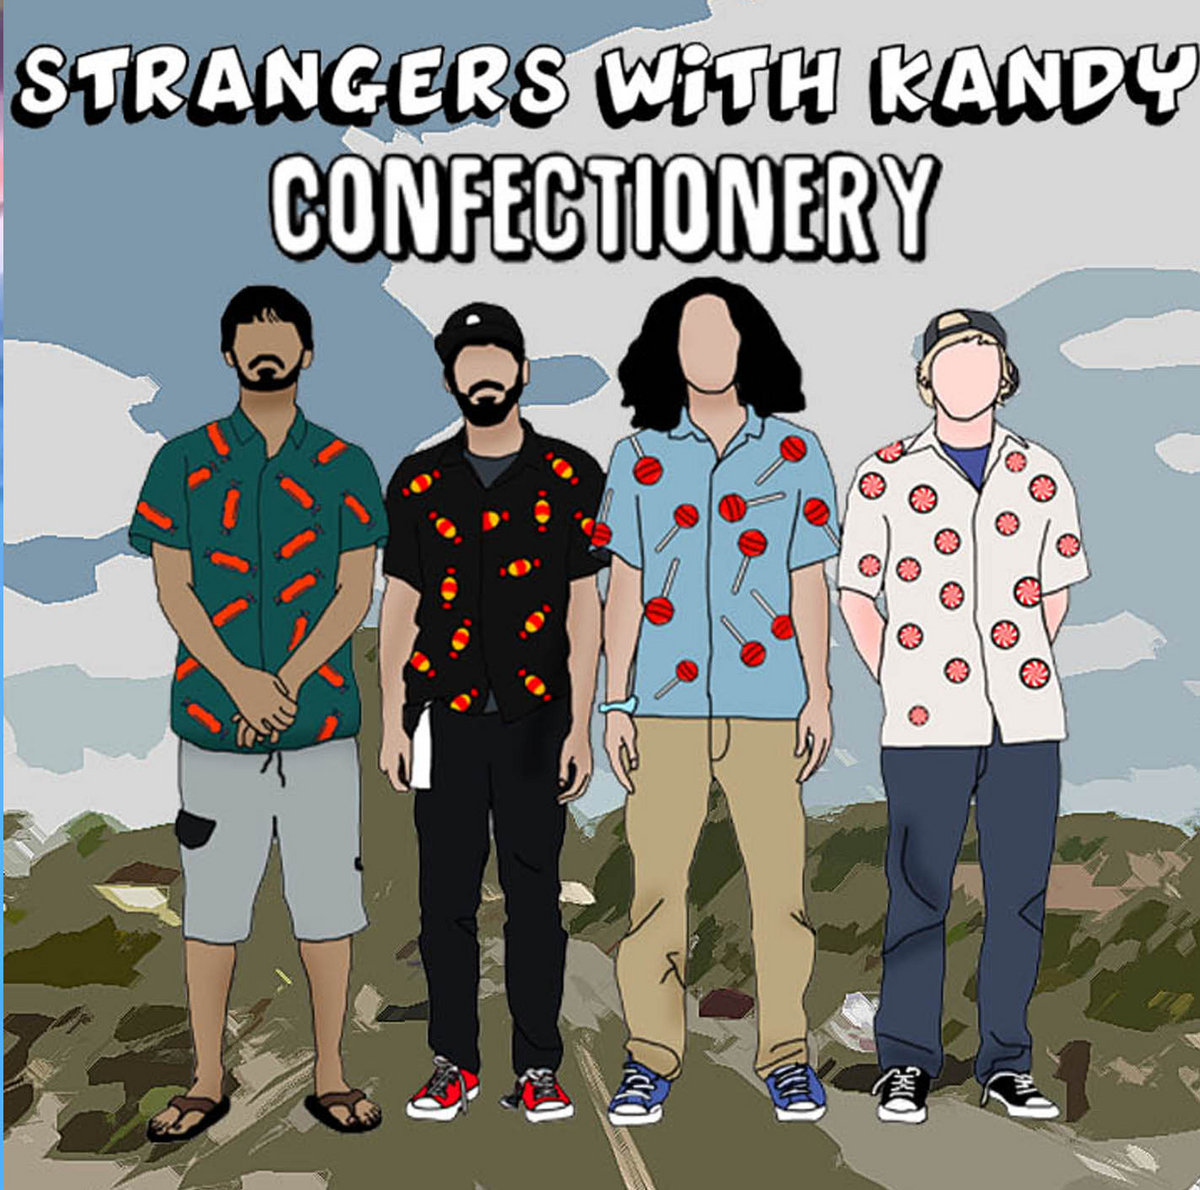 www.facebook.com/strangerswithkandy